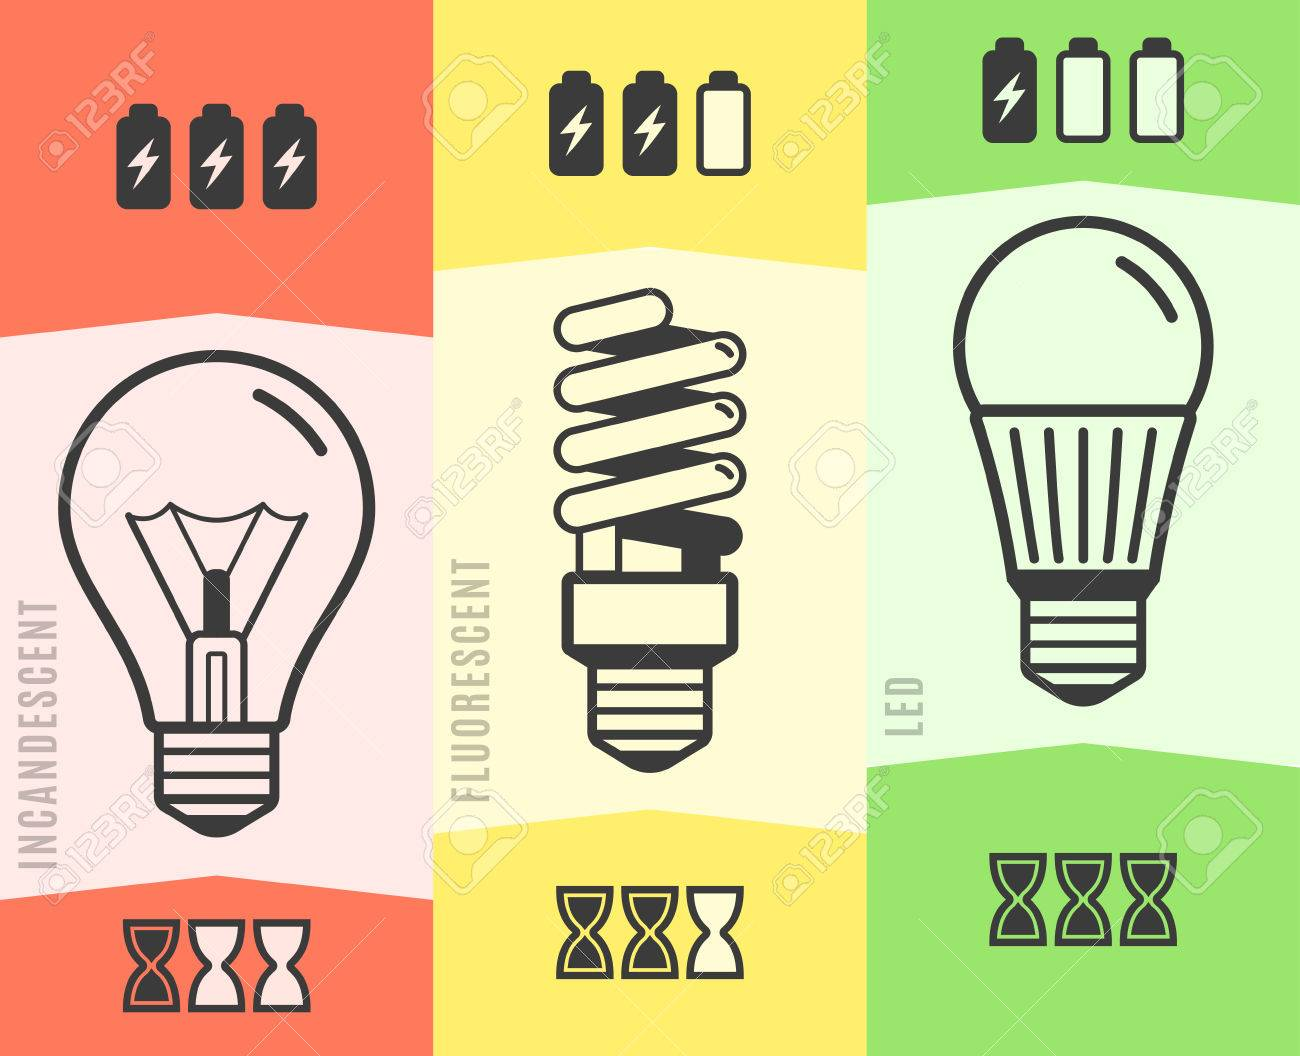 light bulb efficiency comparison chart infographic. vector